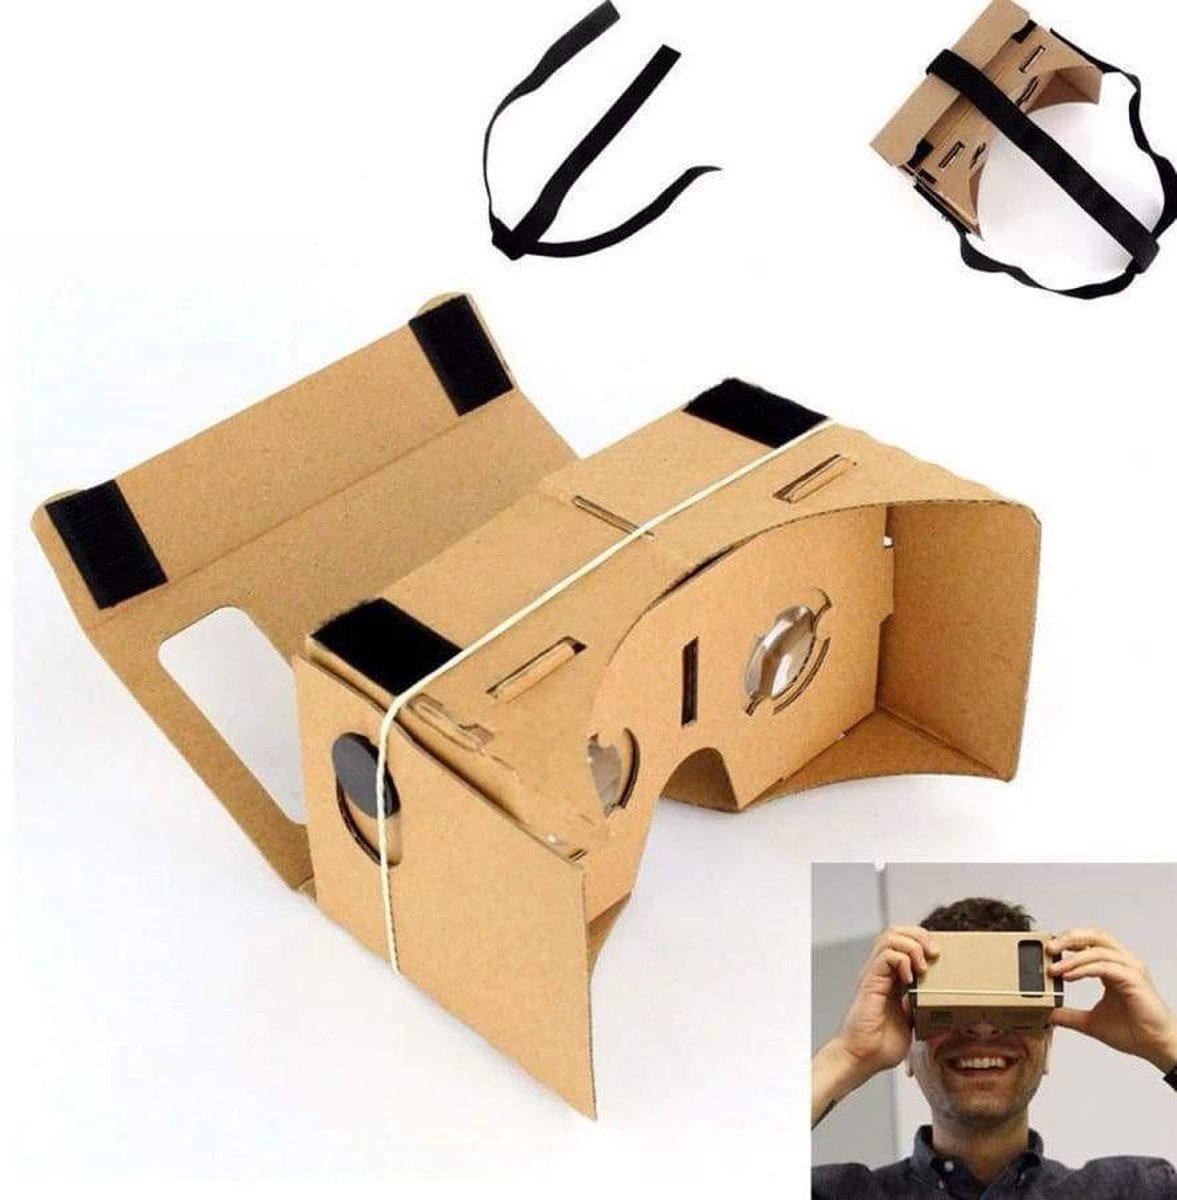 De Nieuwste Versie Van De (Google) Cardboard V2 Inclusief Hoofdband / Virtual Reality 3D bril!